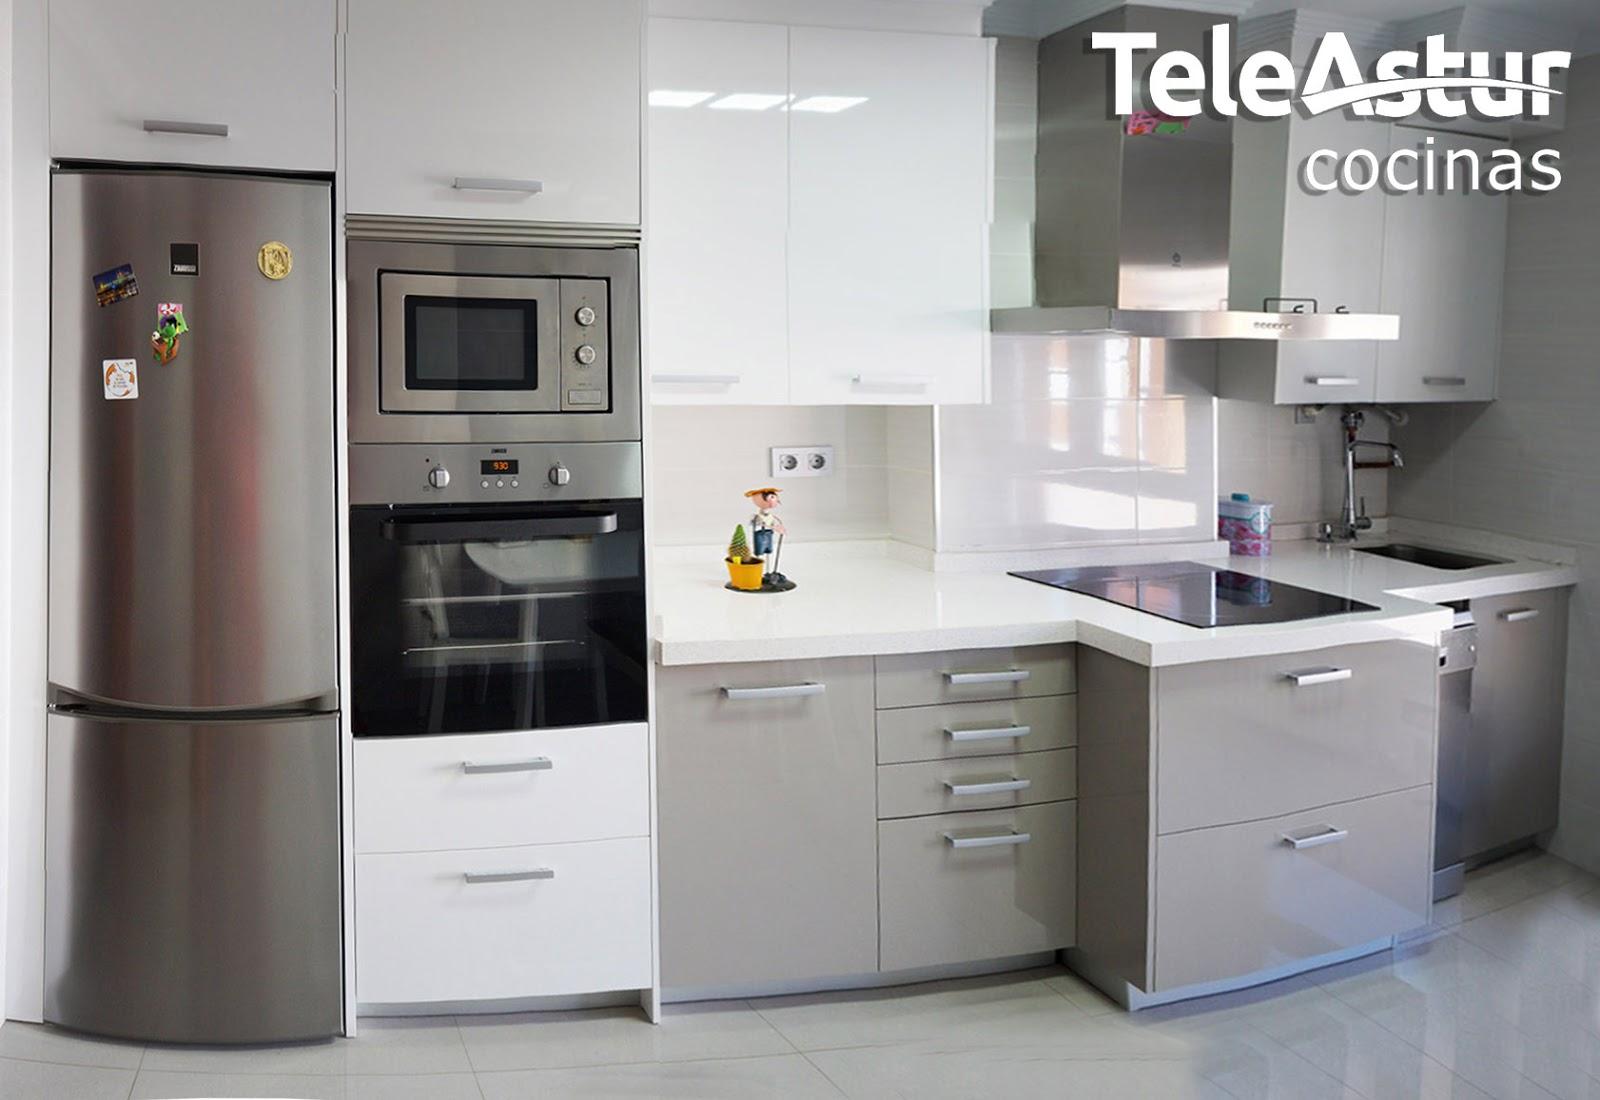 Teleastur muebles de cocina reformas oviedo aviles for Muebles de cocina en oviedo